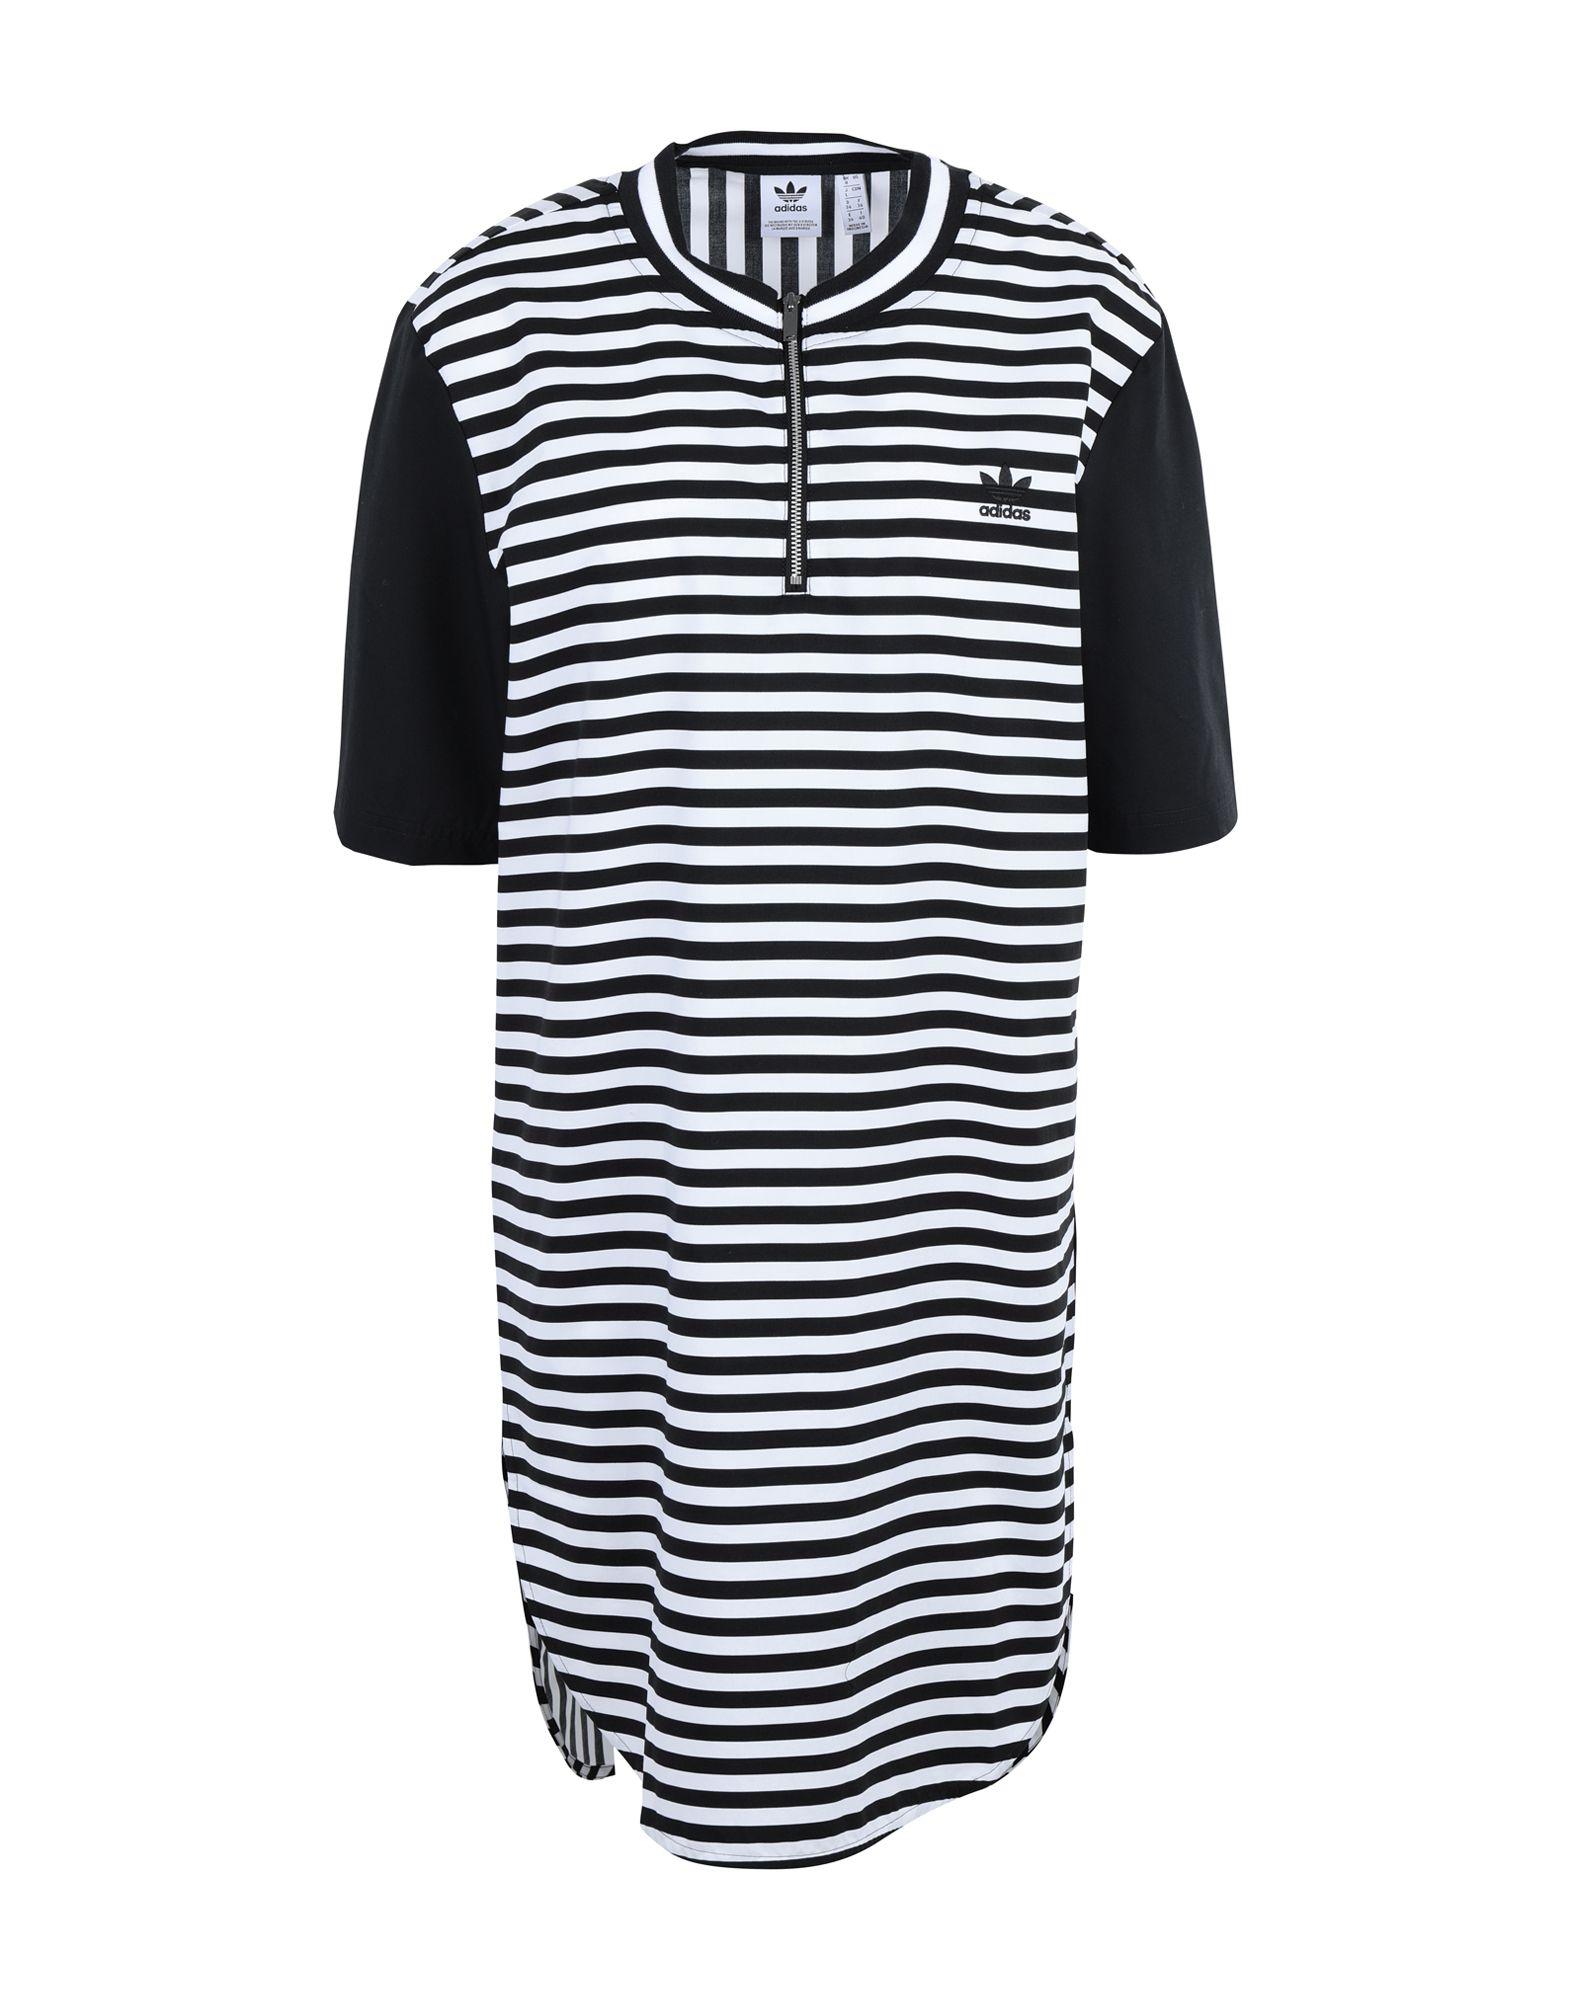 1950836a297 Αθλητικά Ρούχα Και Φόρμες Adidas Originals Γυναίκα Κολεξιόν  Άνοιξη-Καλοκαίρι και Φθινόπωρο-Χειμώνας, πολλές προσφορές online στο YOOX